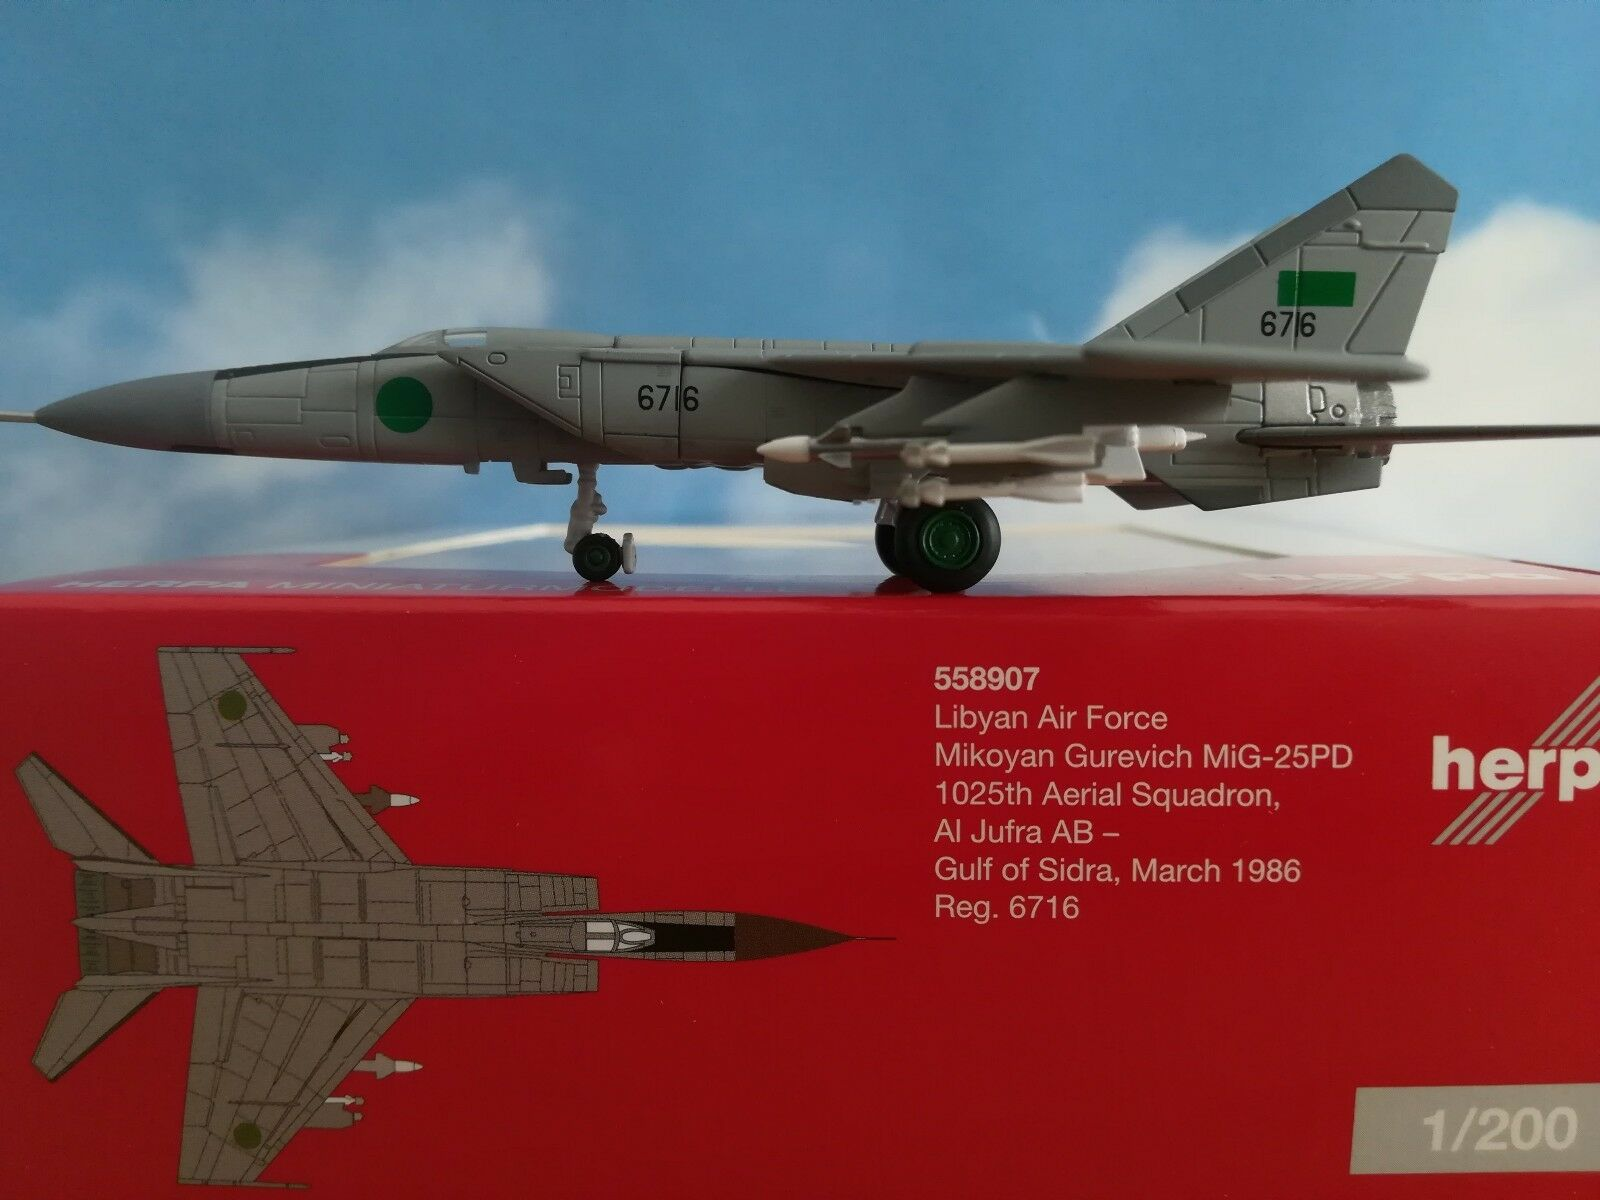 558907 Libyan Air Force Mikoyan Gurevich mig-25pd Herpa Wings 1 200